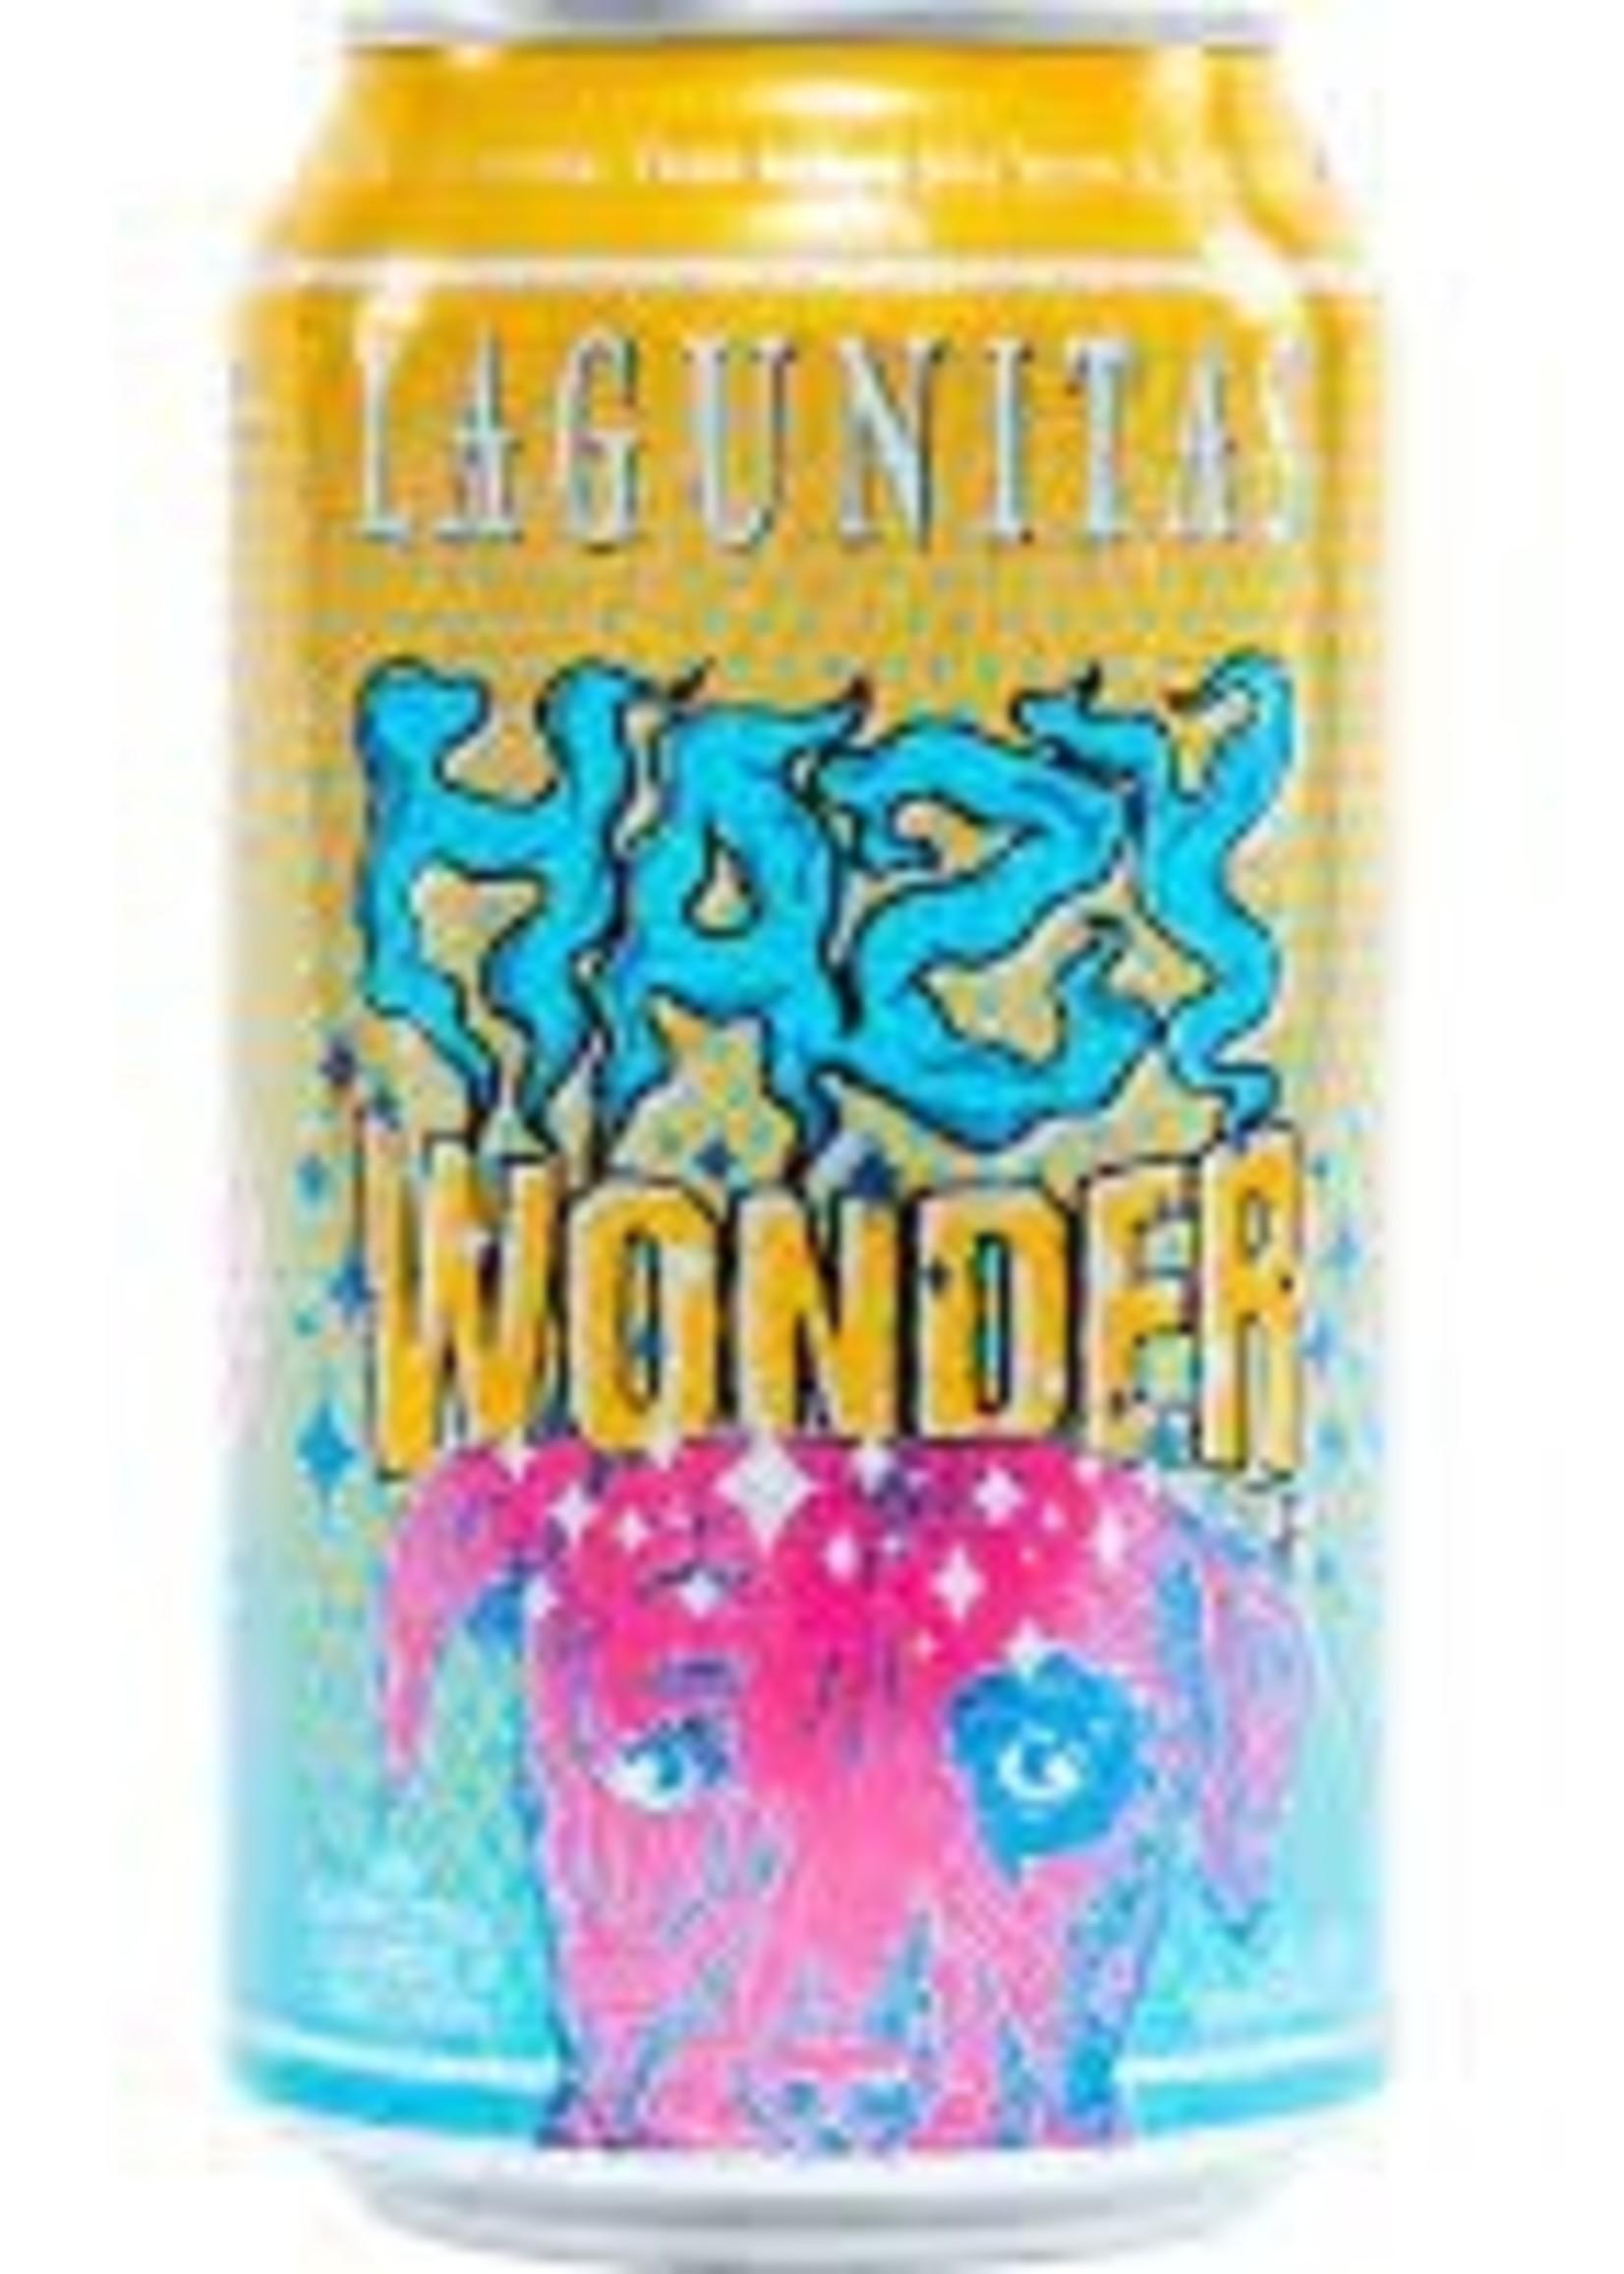 Lagunitas Hazy Wonder IPA - 6x12oz Cans